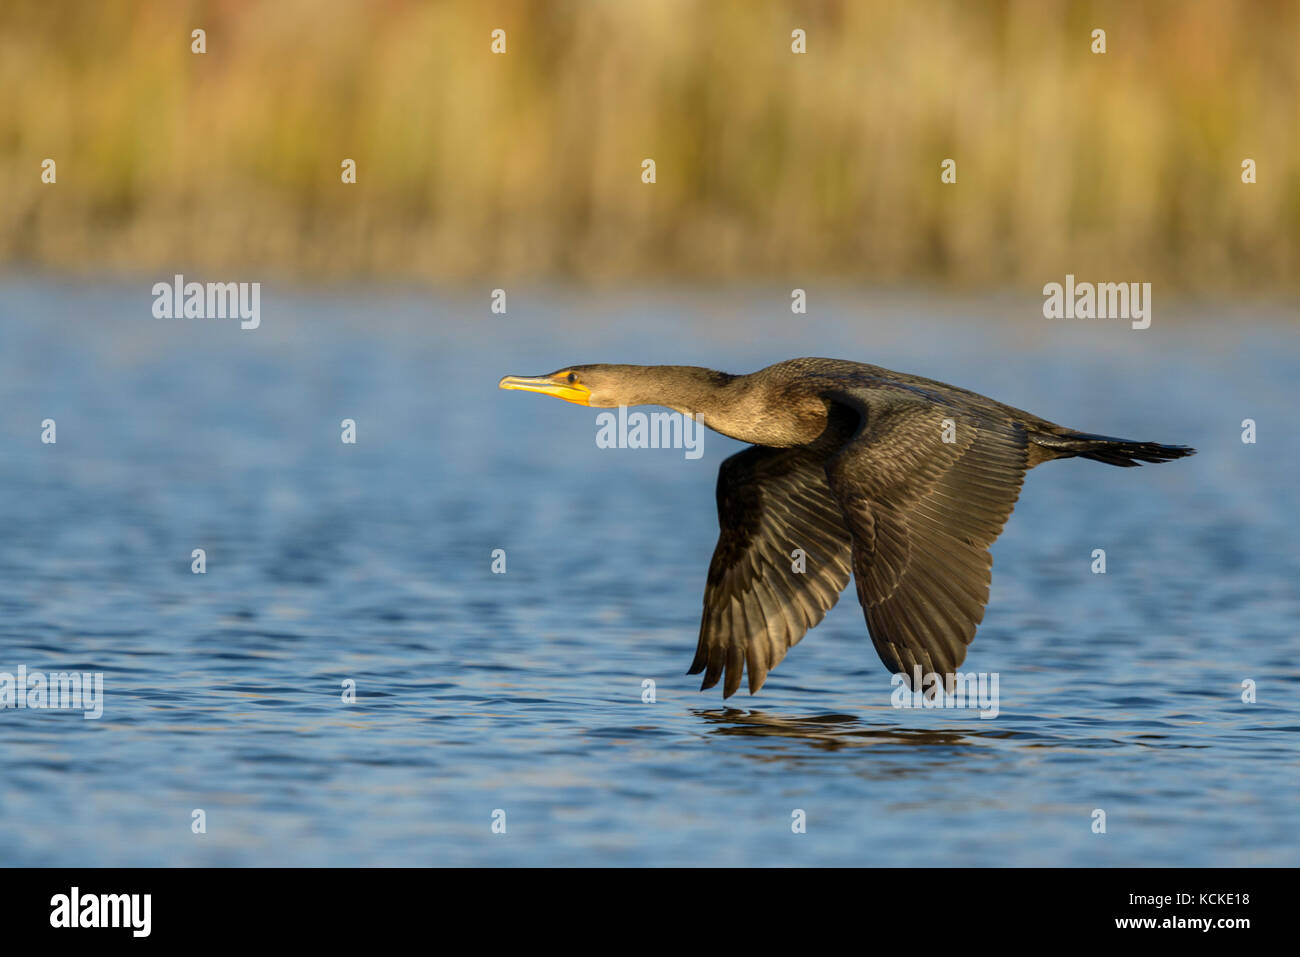 Neotropic Cormorant, Phalacrocorax brasilianus, flying over marsh, Saskatchewan, Canada - Stock Image